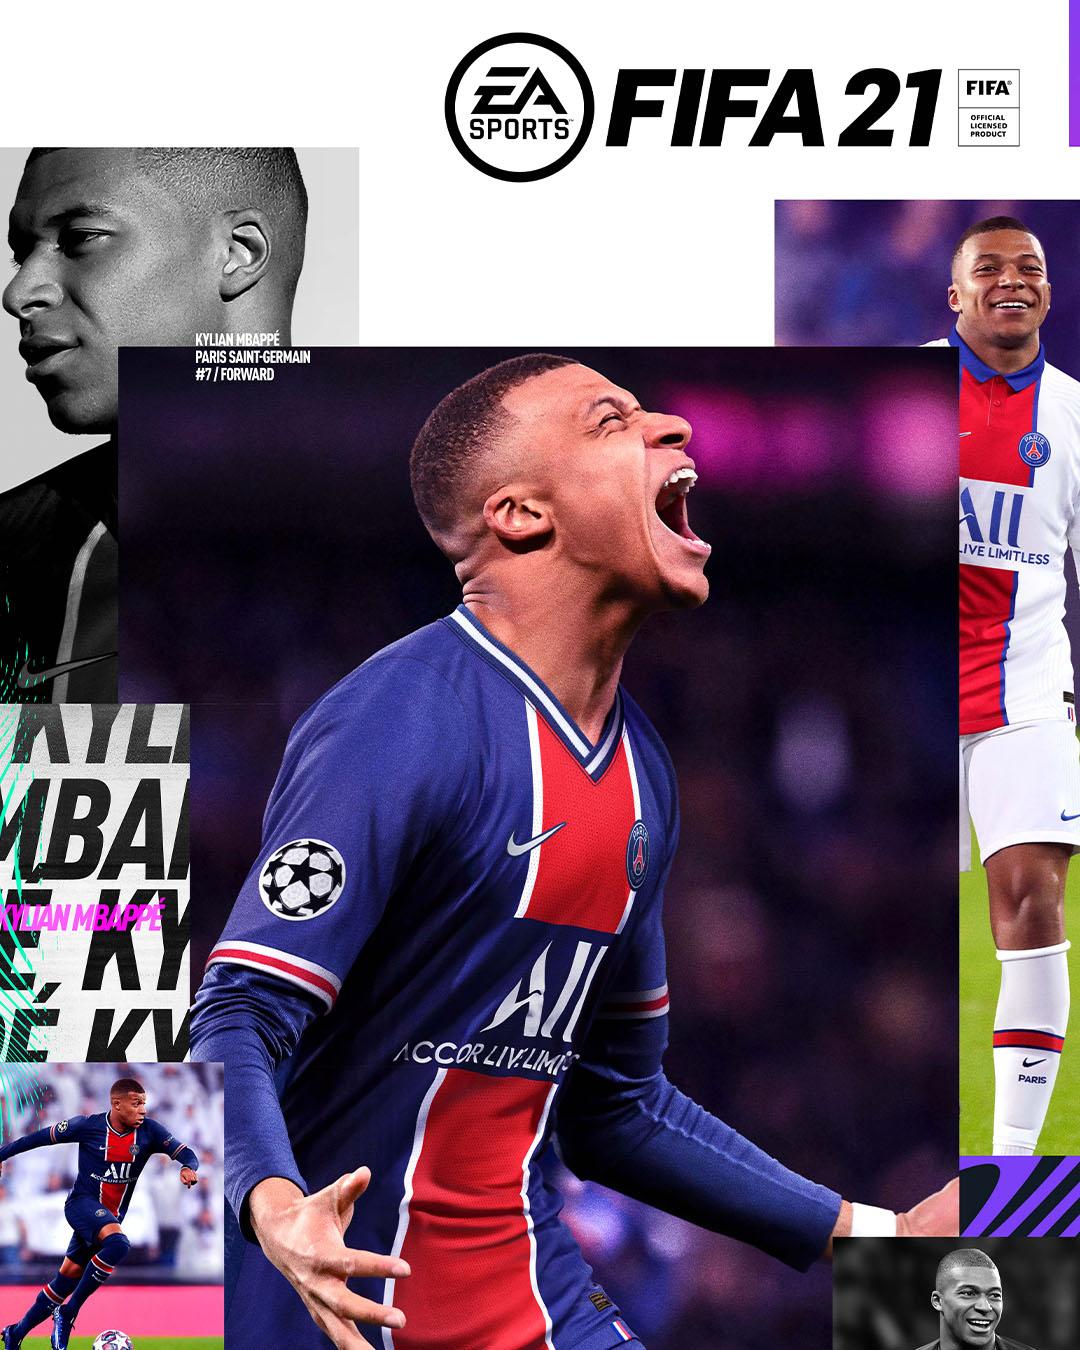 FIFA 21 ⚽(ORIGIN/REGION FREE) ✅+ПОДАРОК